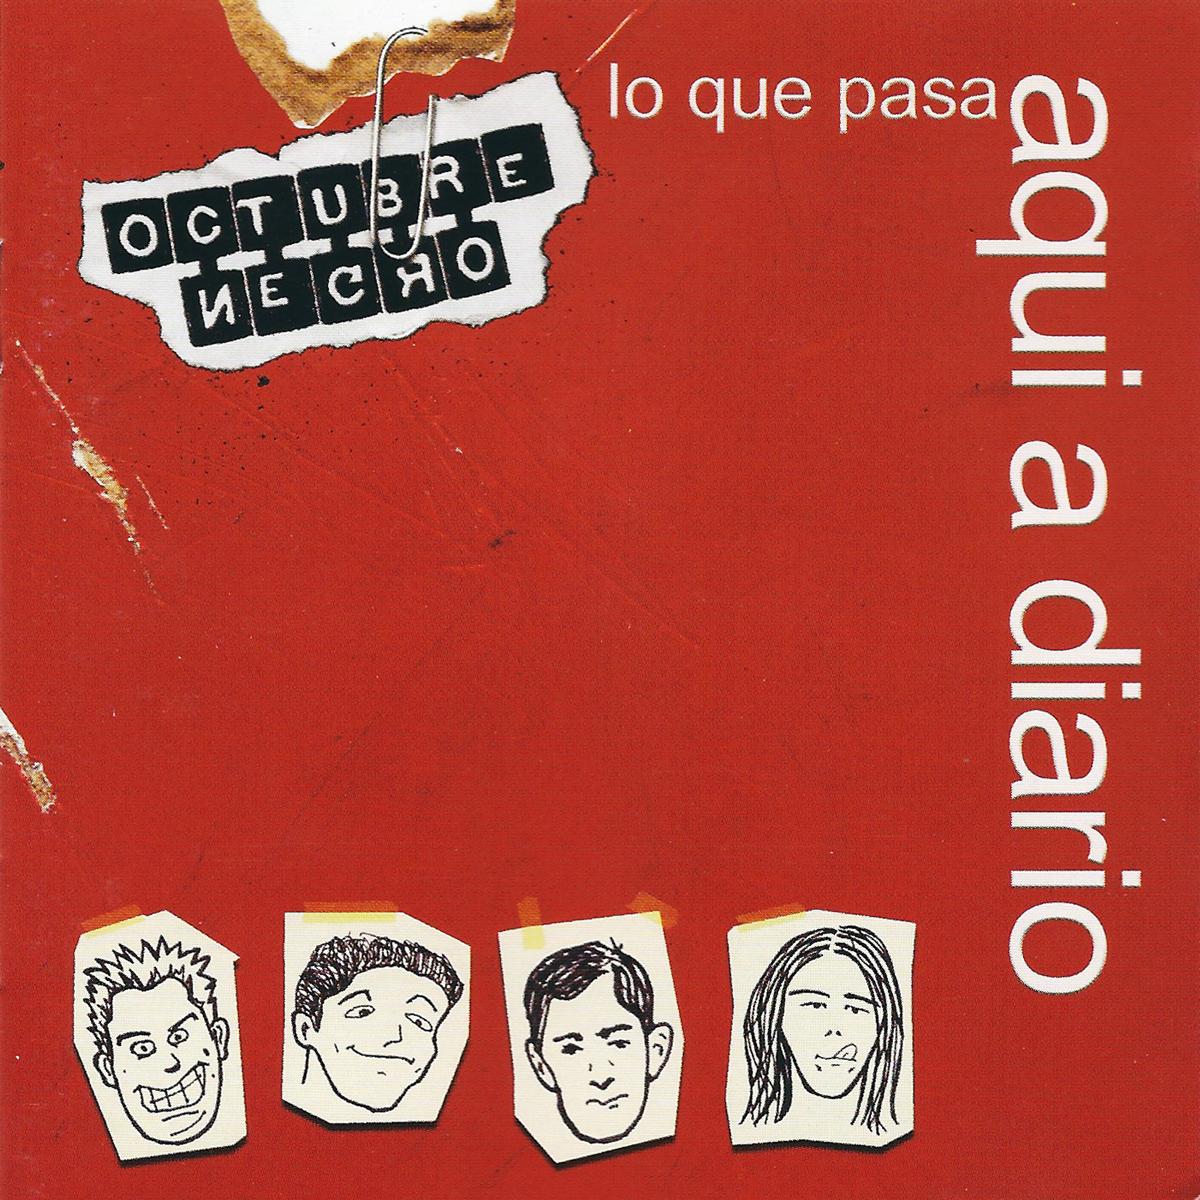 TPR904 Octubre Negro - Lo Que Pasa Aqui A Diario